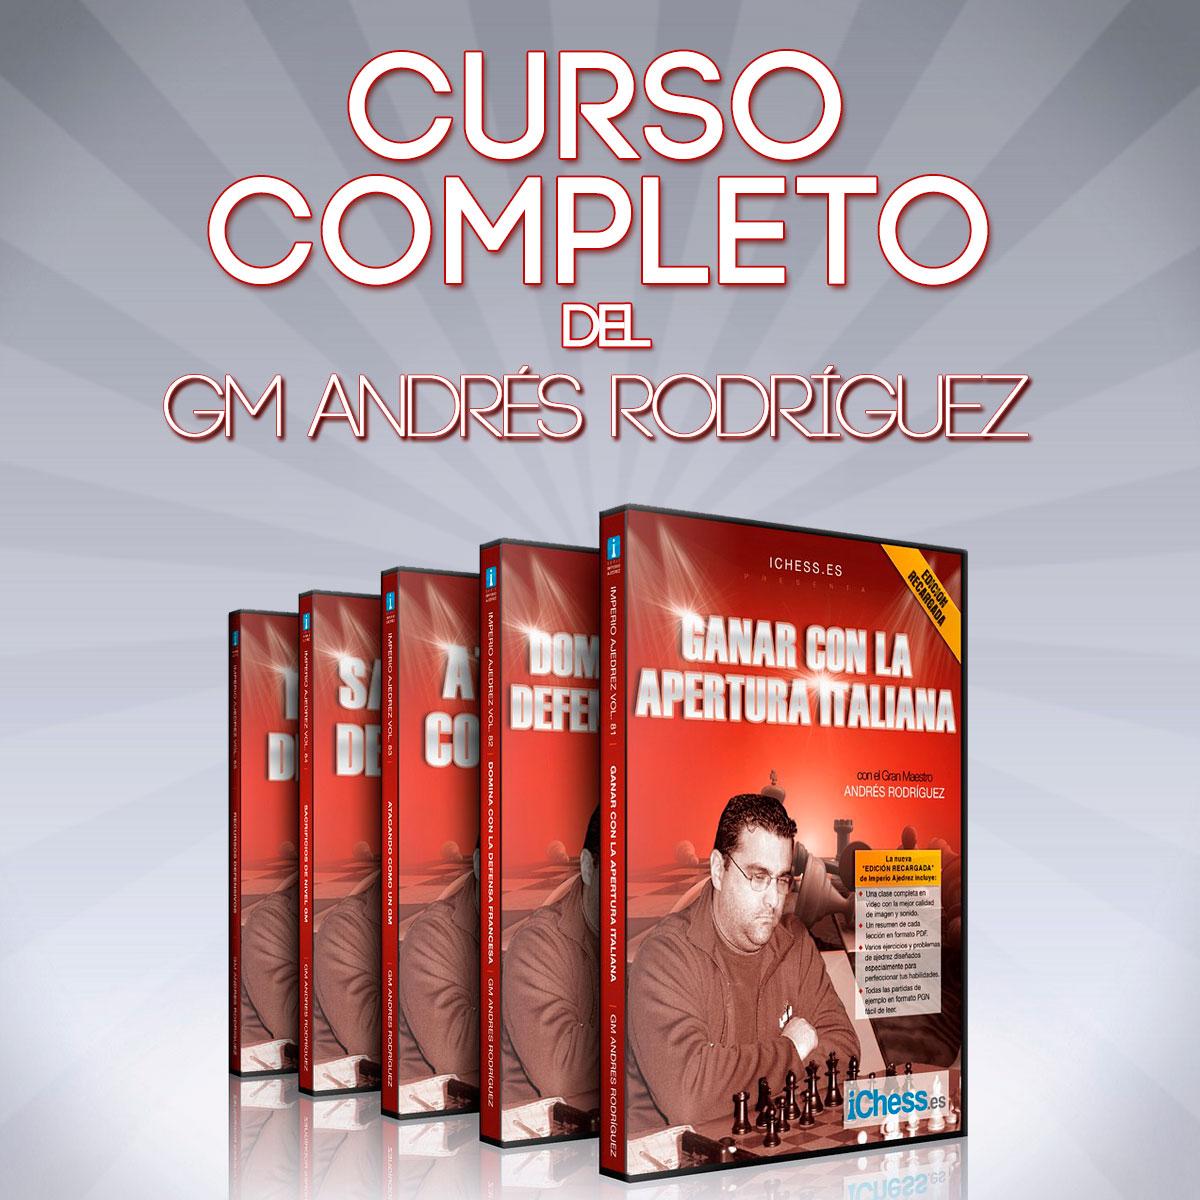 CursoCompleto-AndresRodriguez